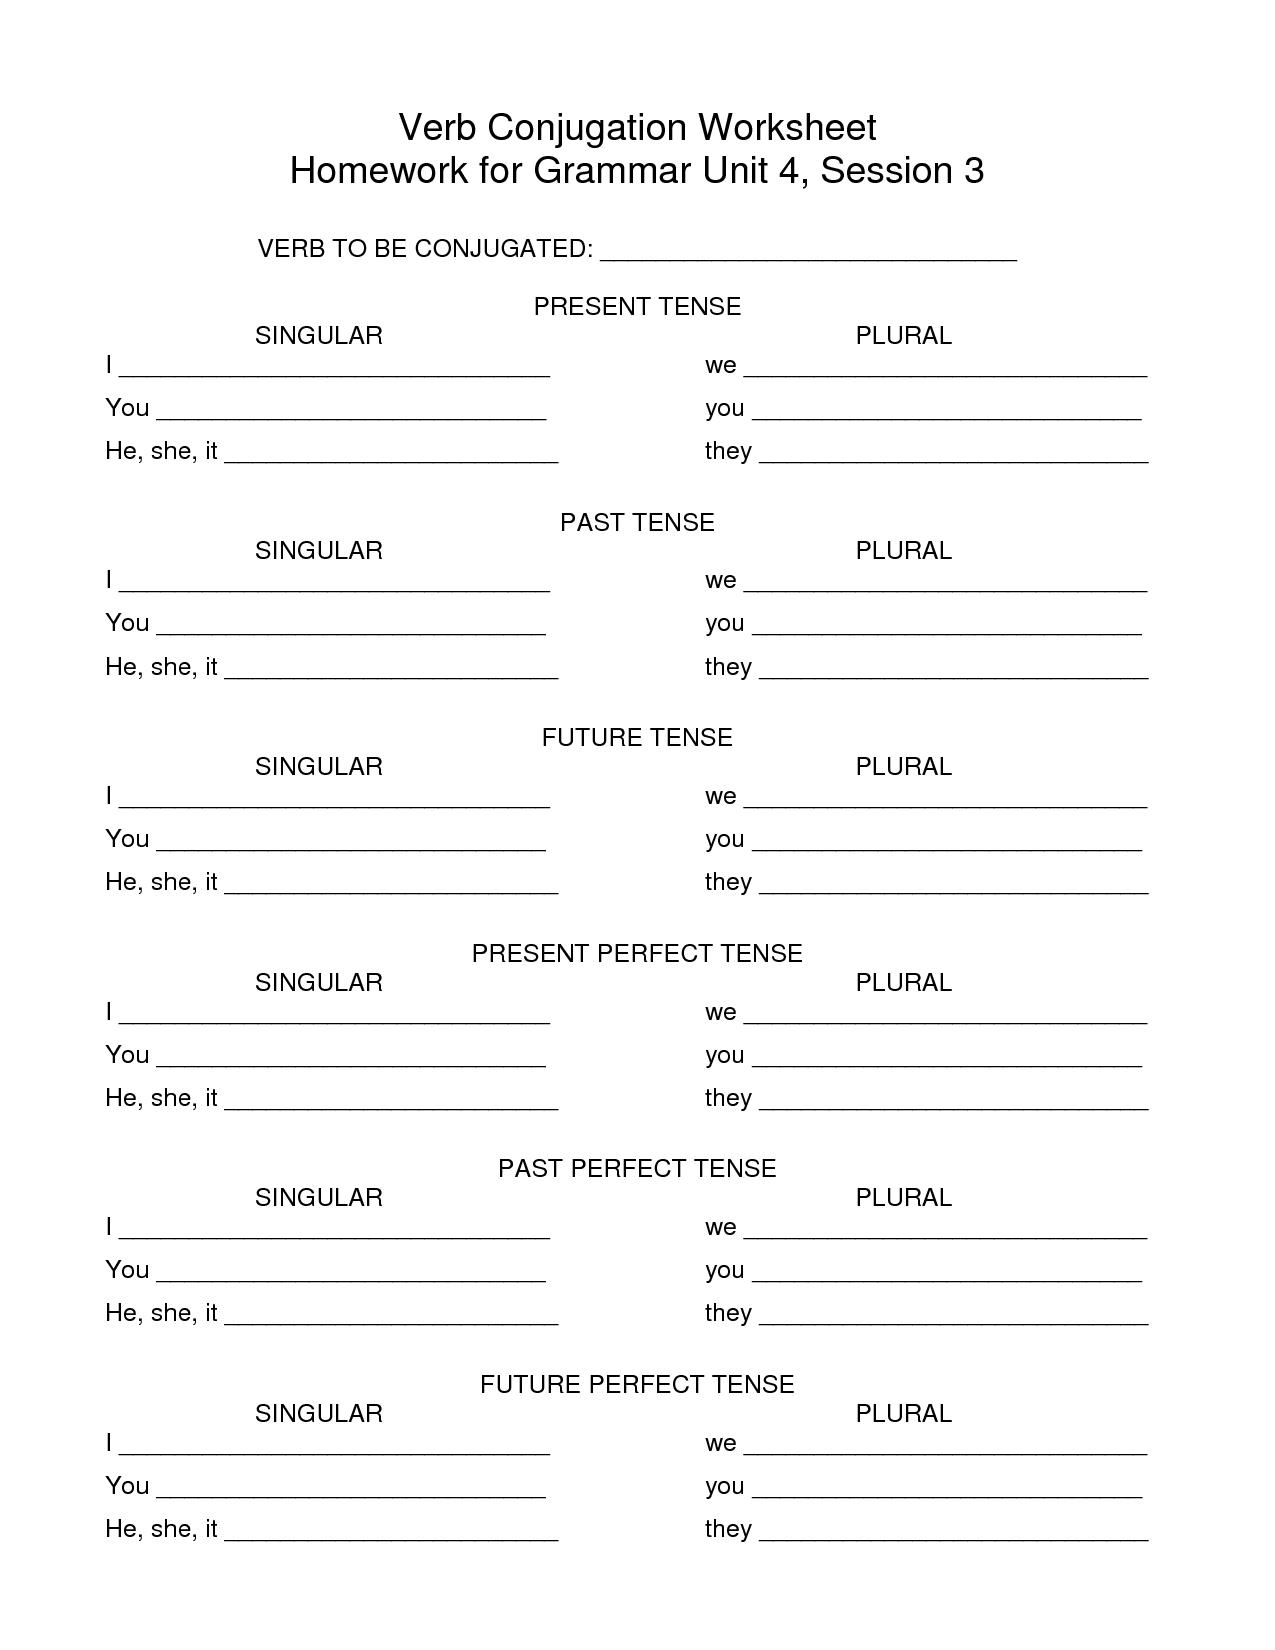 Spanish Verb Conjugation Worksheets Blank